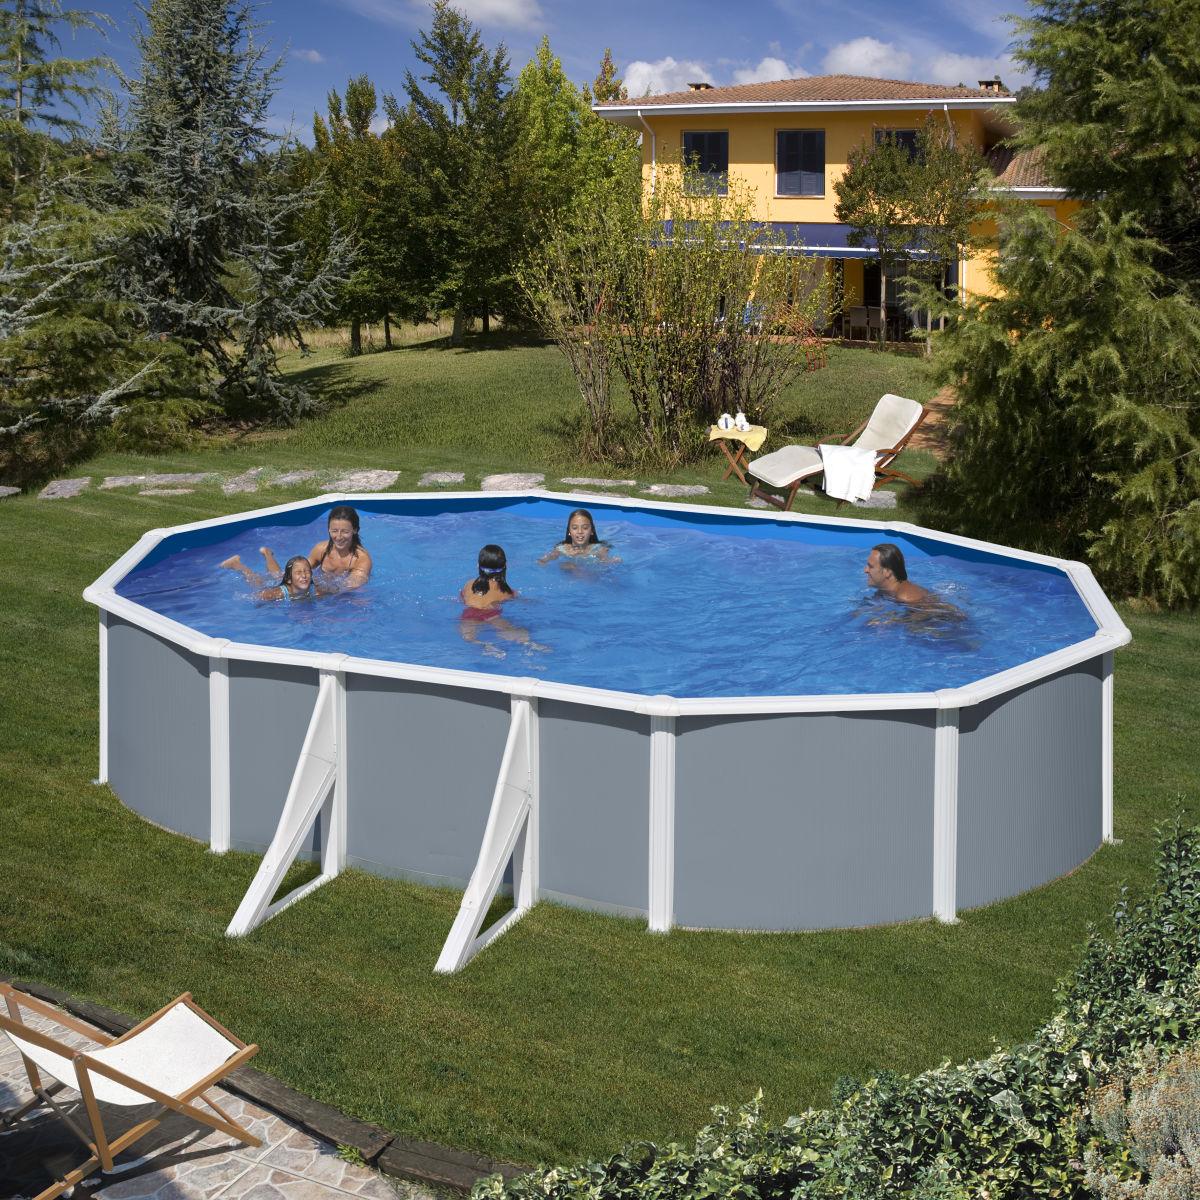 Piscina ovale kitadeo 500 x 300 cm prezzi e offerte online for Arena piscina leroy merlin